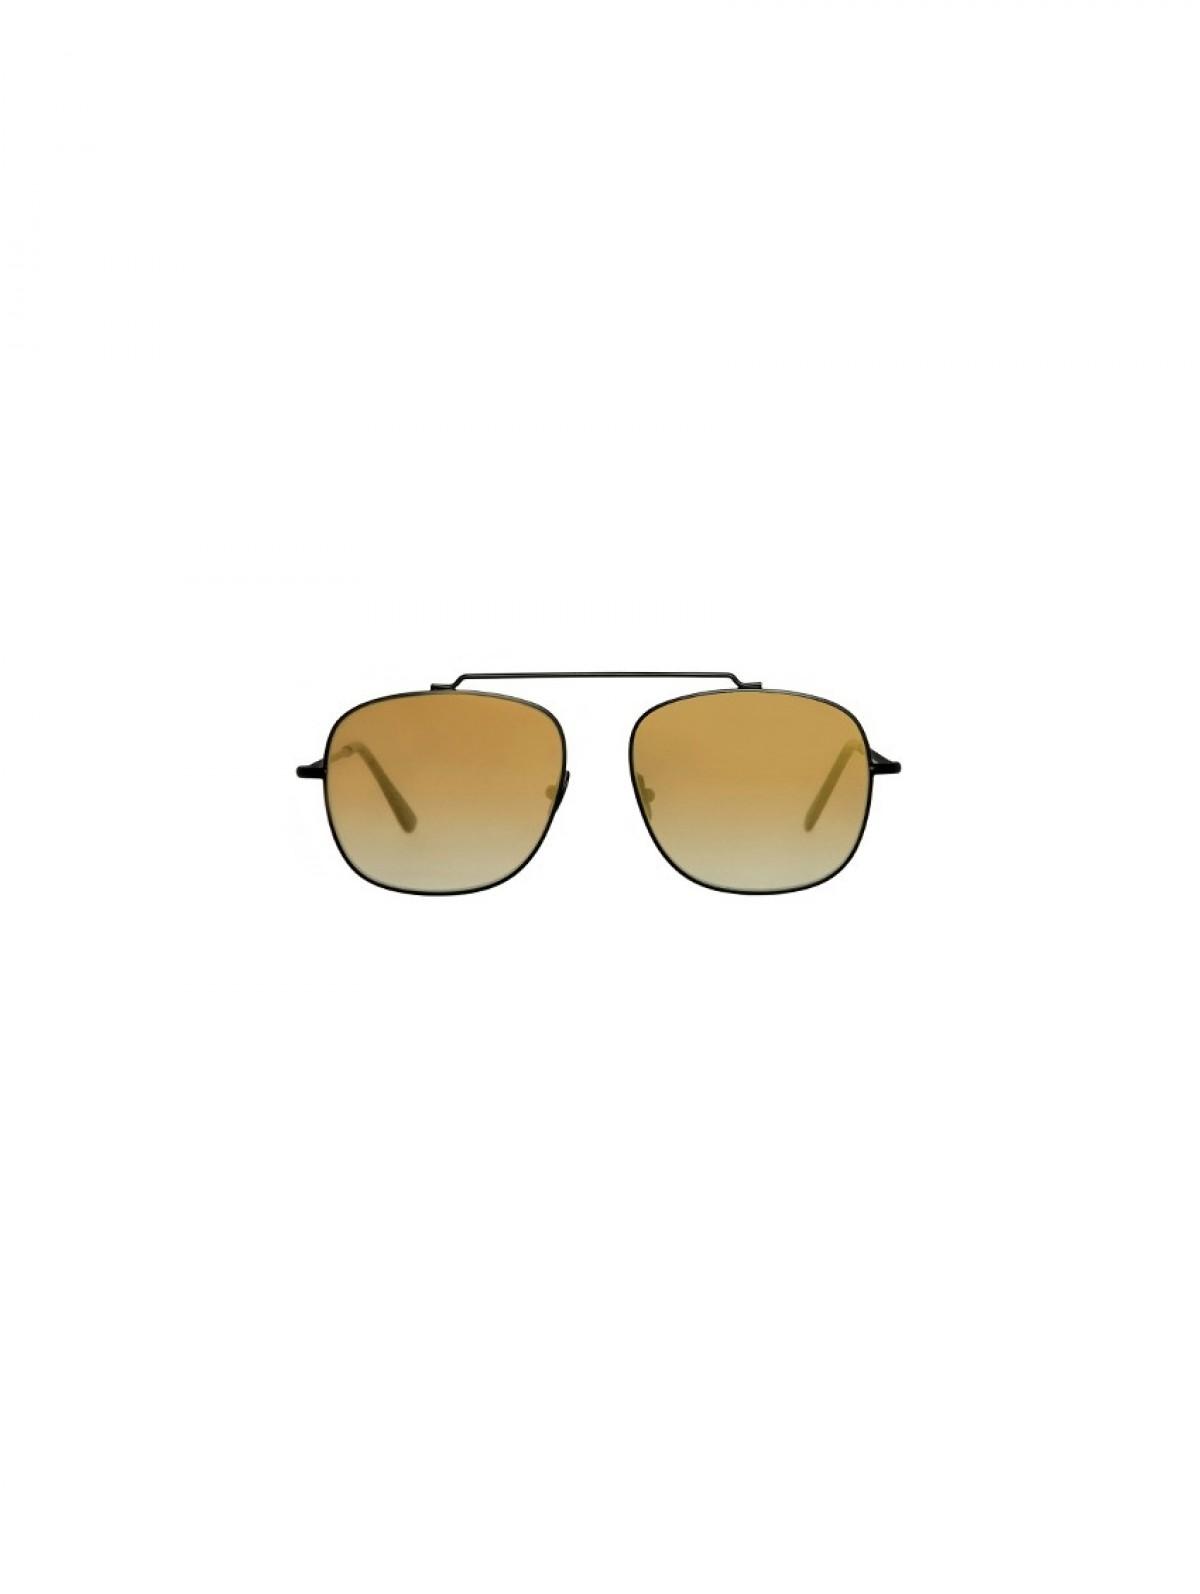 Montana MO01DFT 56, 165,00€, Occhiali Spektre Nero a forma Rettangolare